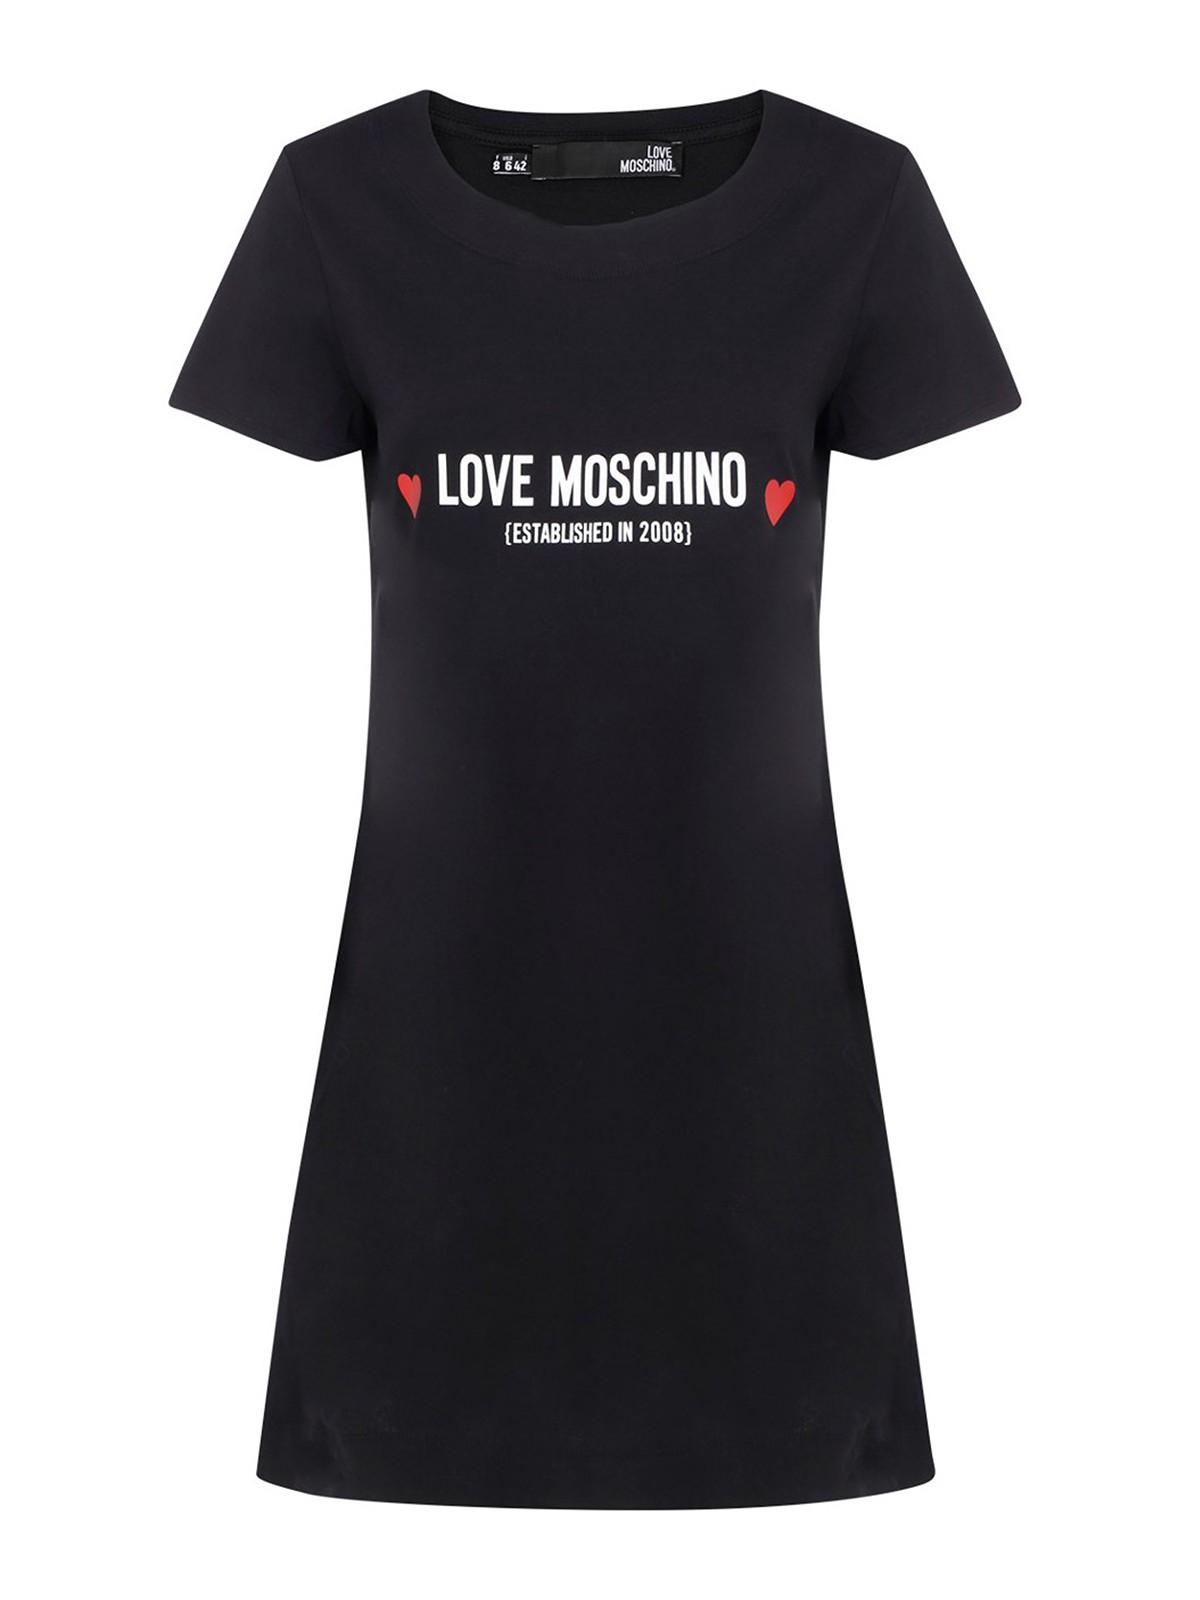 LOVE MOSCHINO SHORT T-SHIRT DRESS